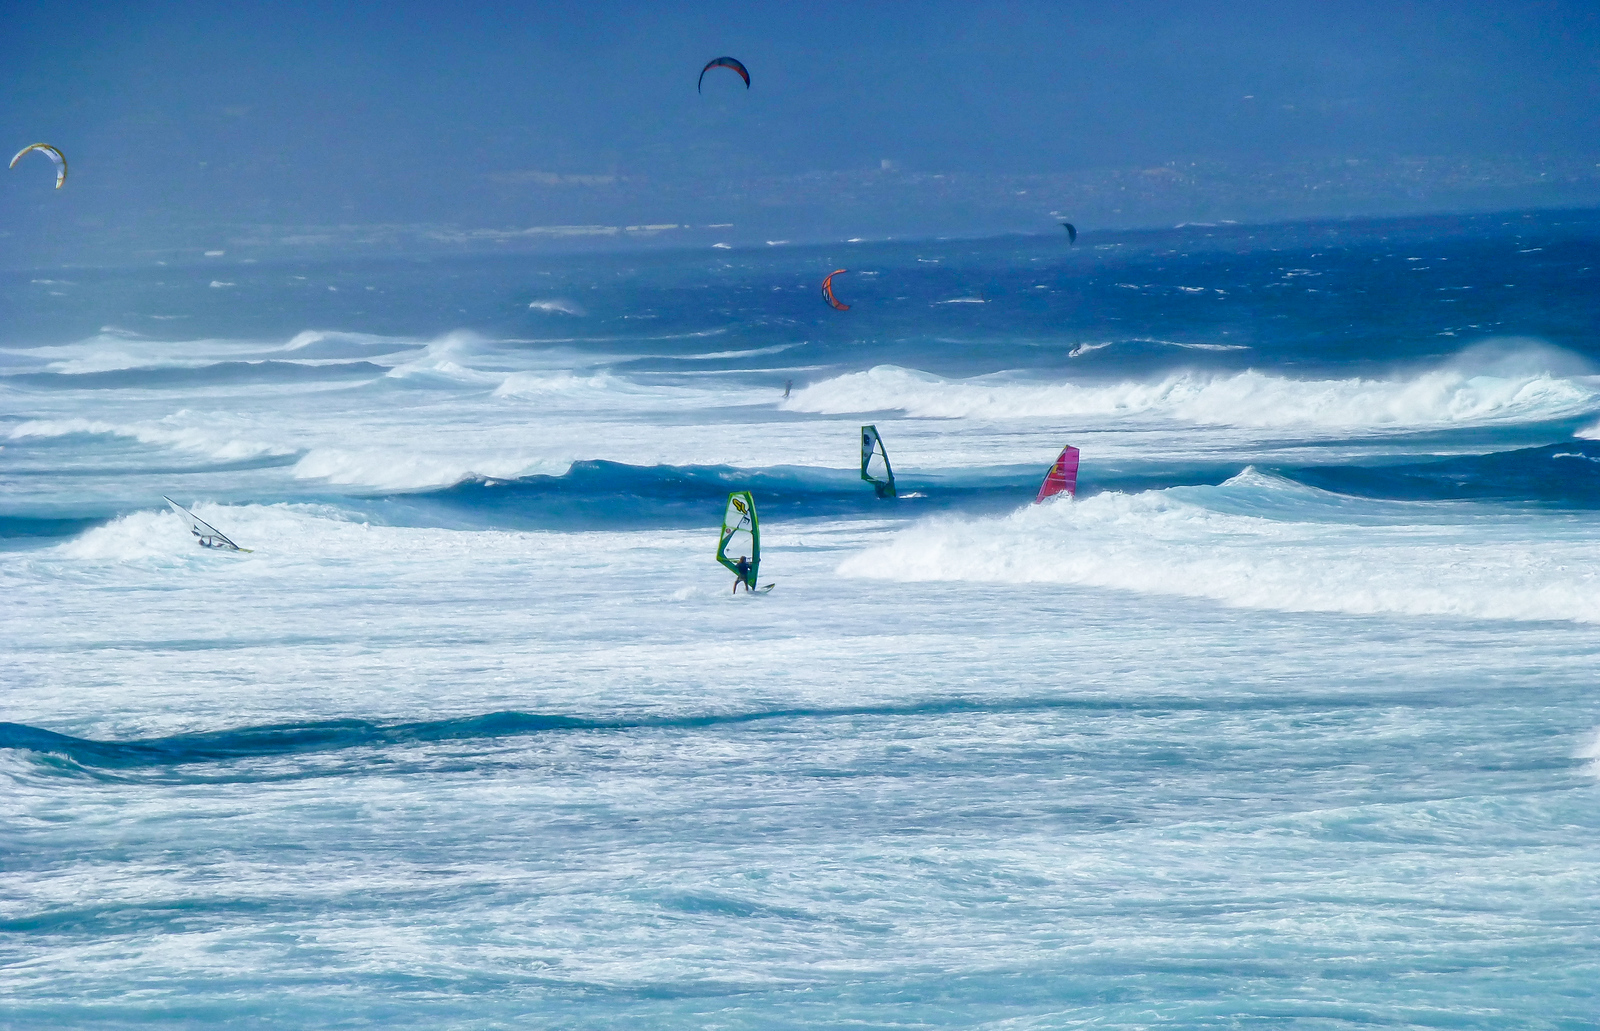 3 week Hawaii itinerary. Paia, Windsurfing Capital of the World